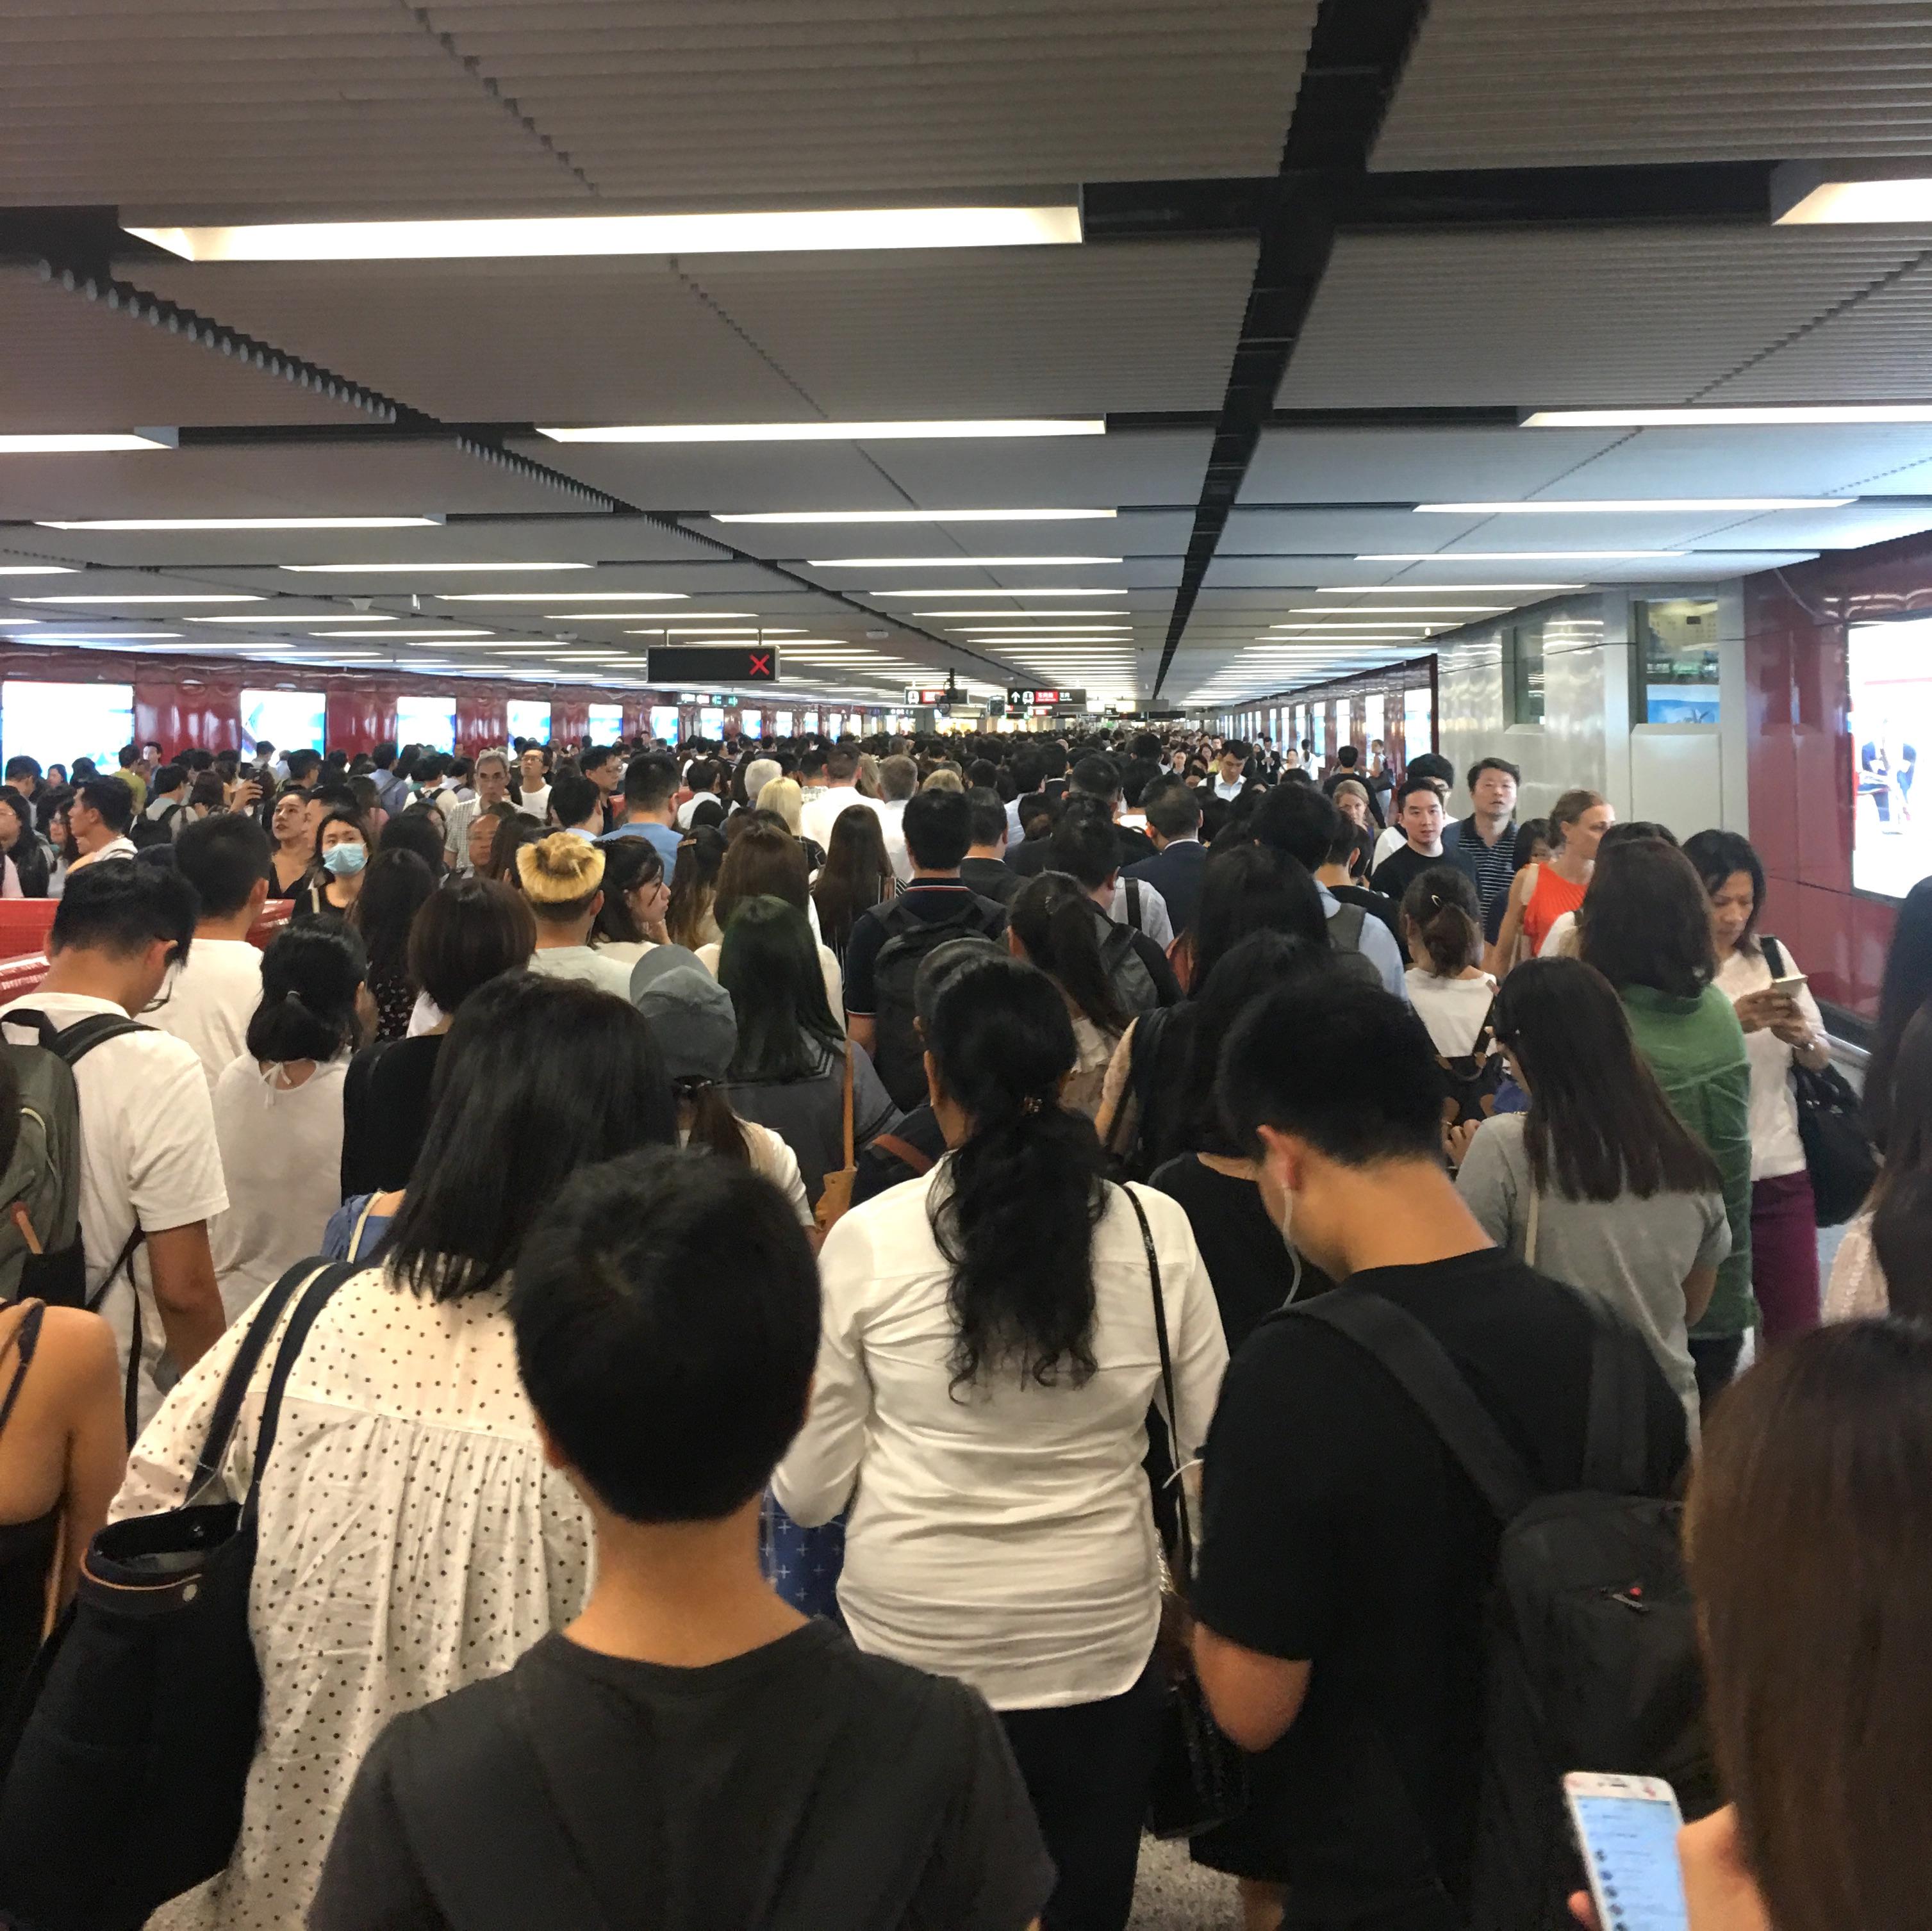 hongkong-mtr-rush-hour